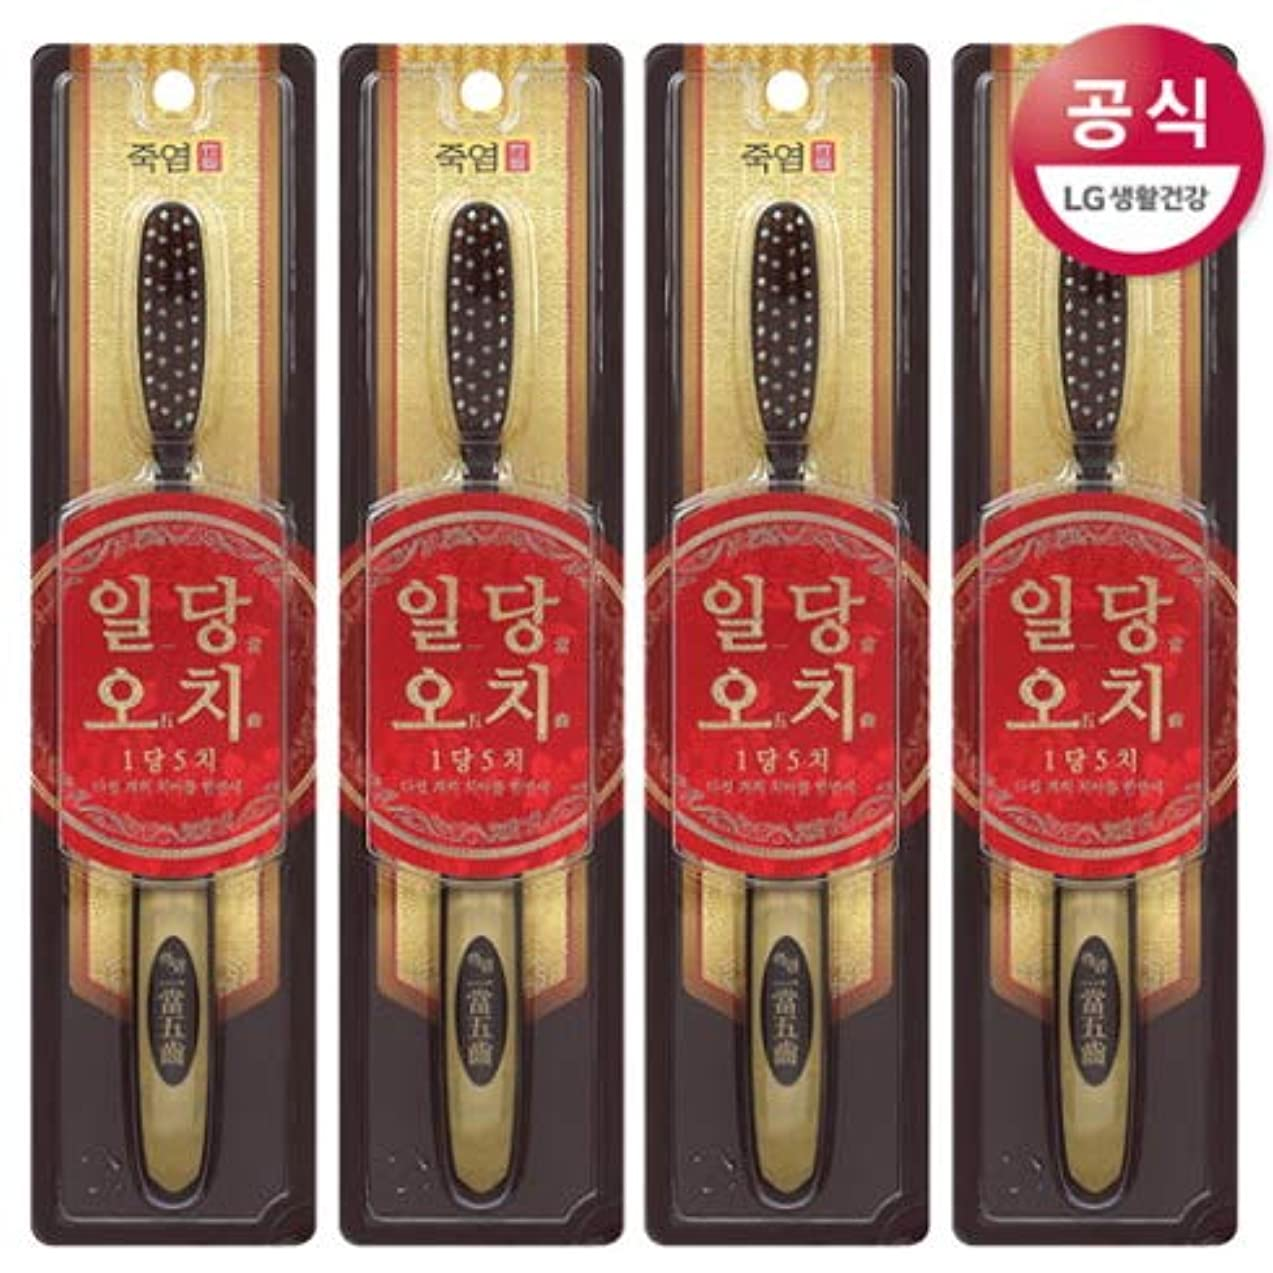 [LG HnB] Bamboo Salt Oodi toothbrush/竹塩日当越智歯ブラシ 5つの(海外直送品)